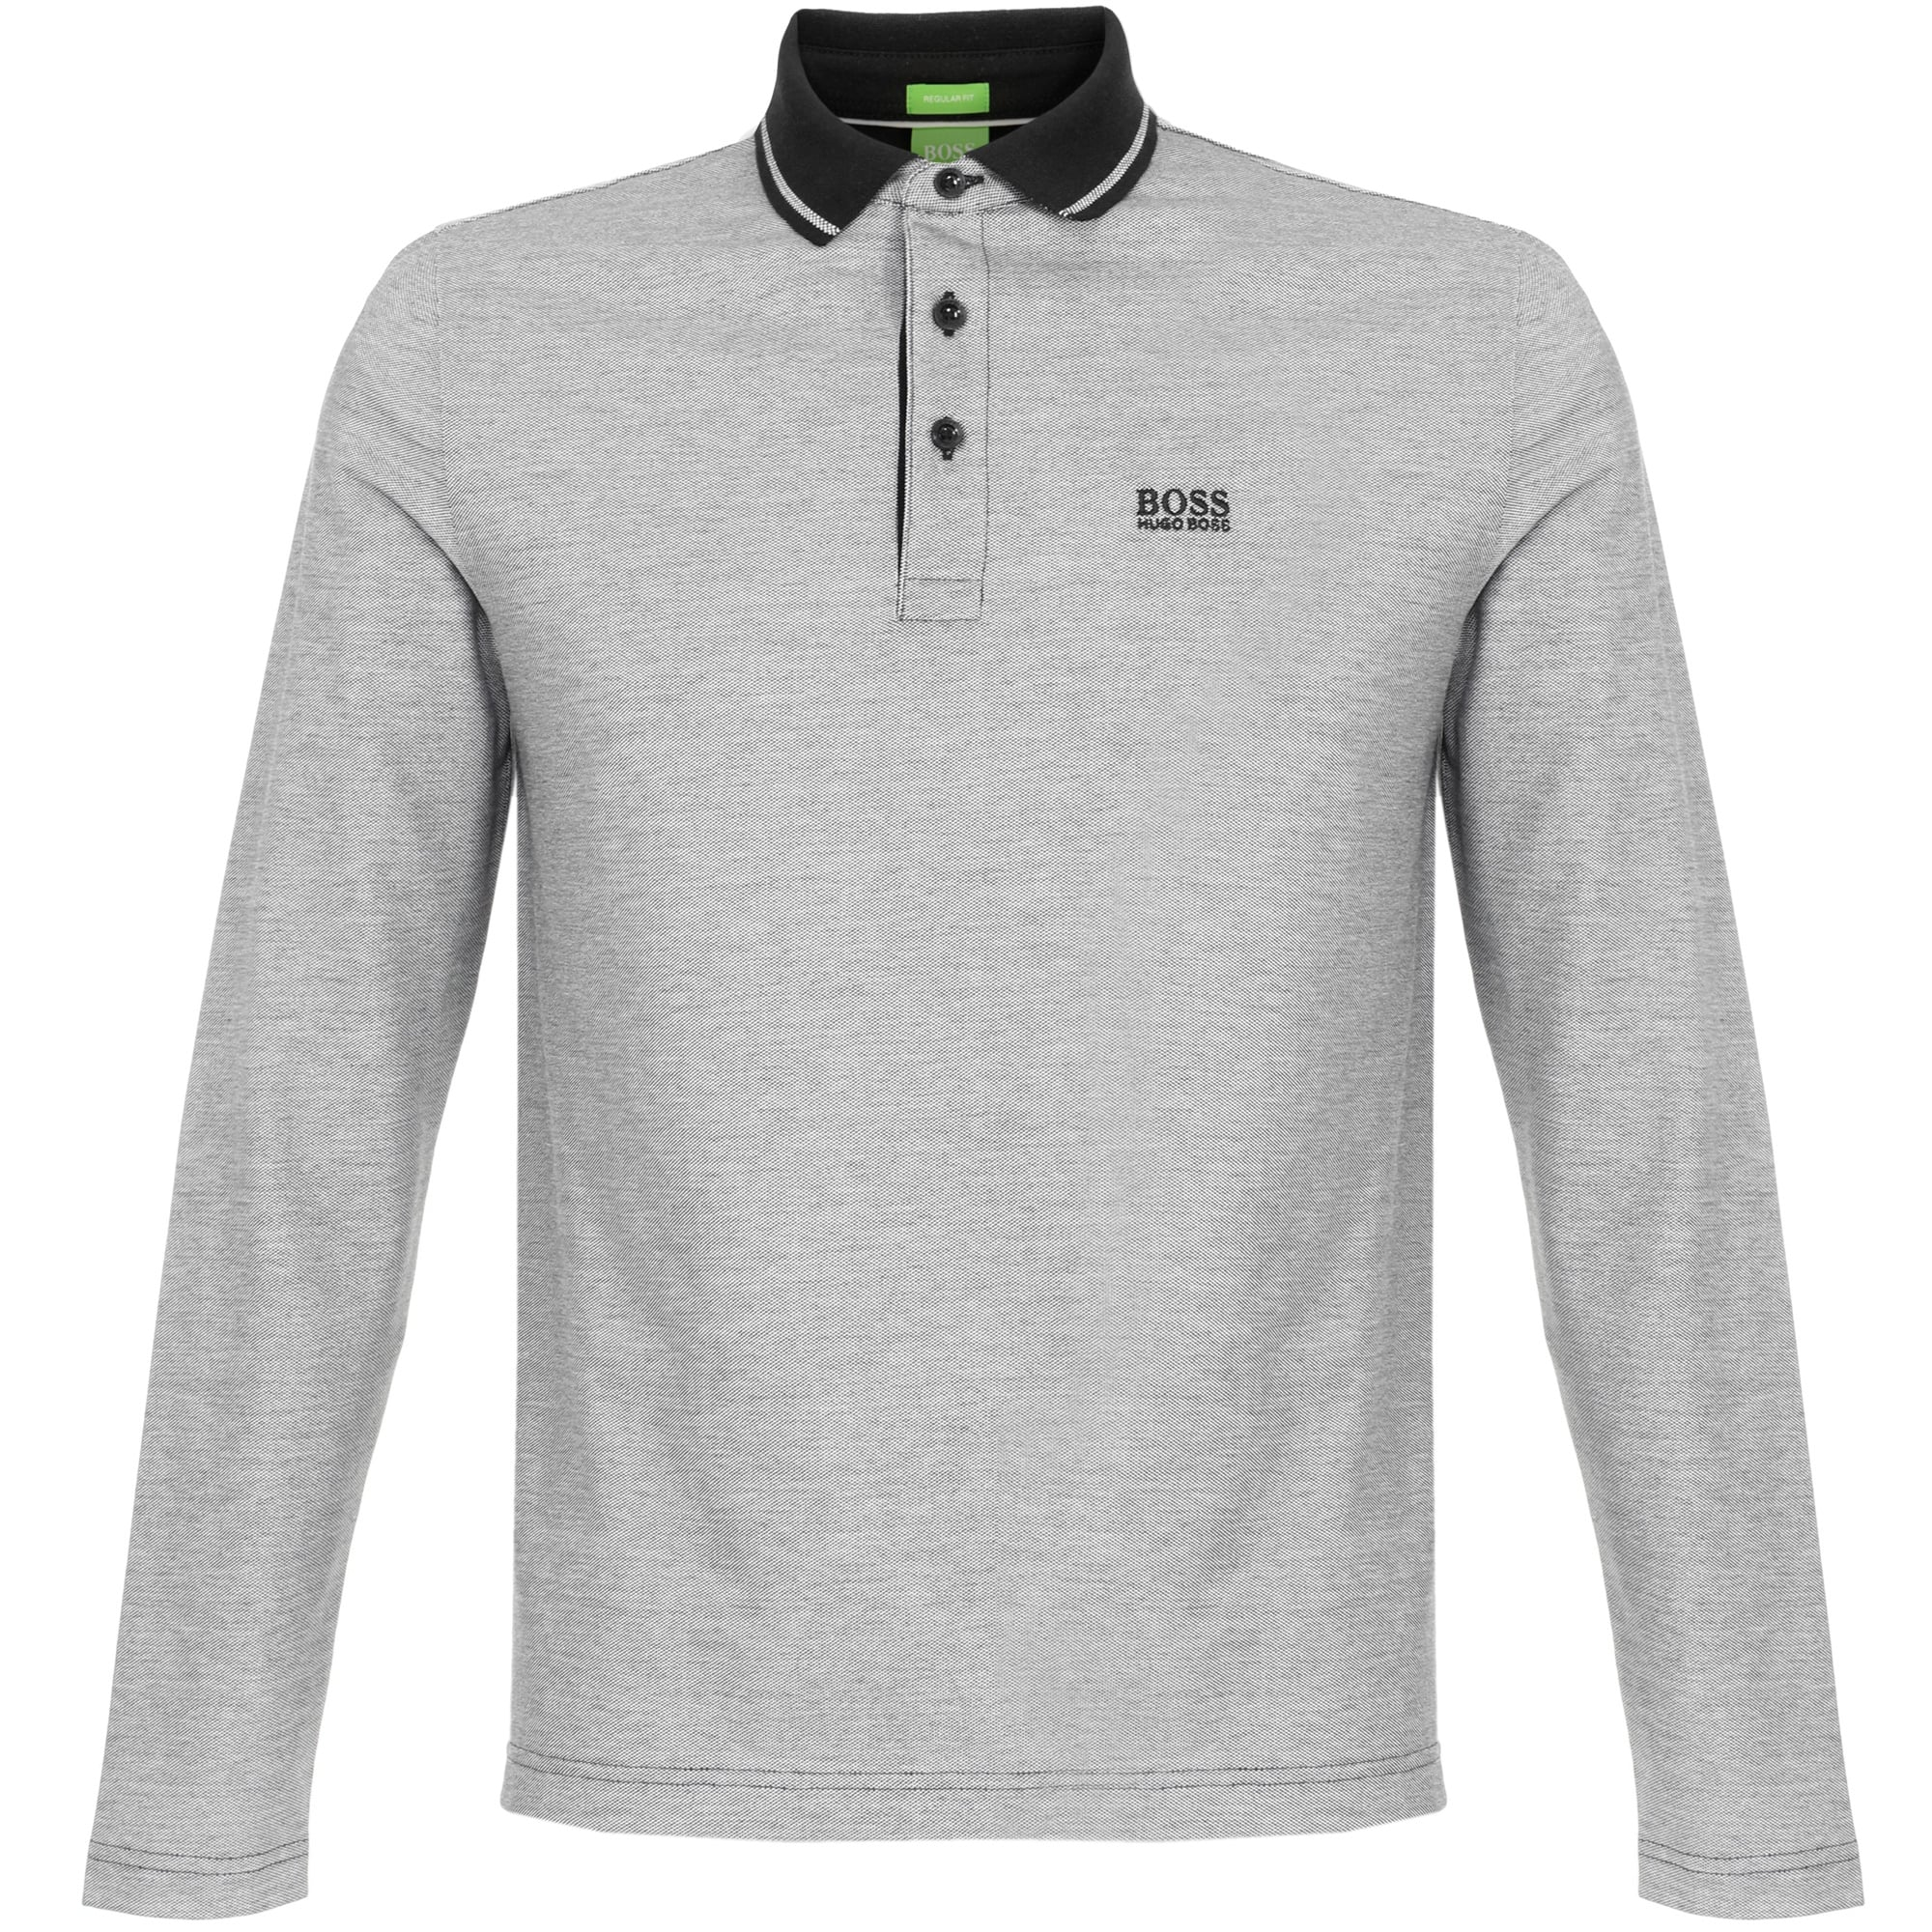 a941fc12 Hugo Boss Shop online | C-prato 1 Black Polo Shirt